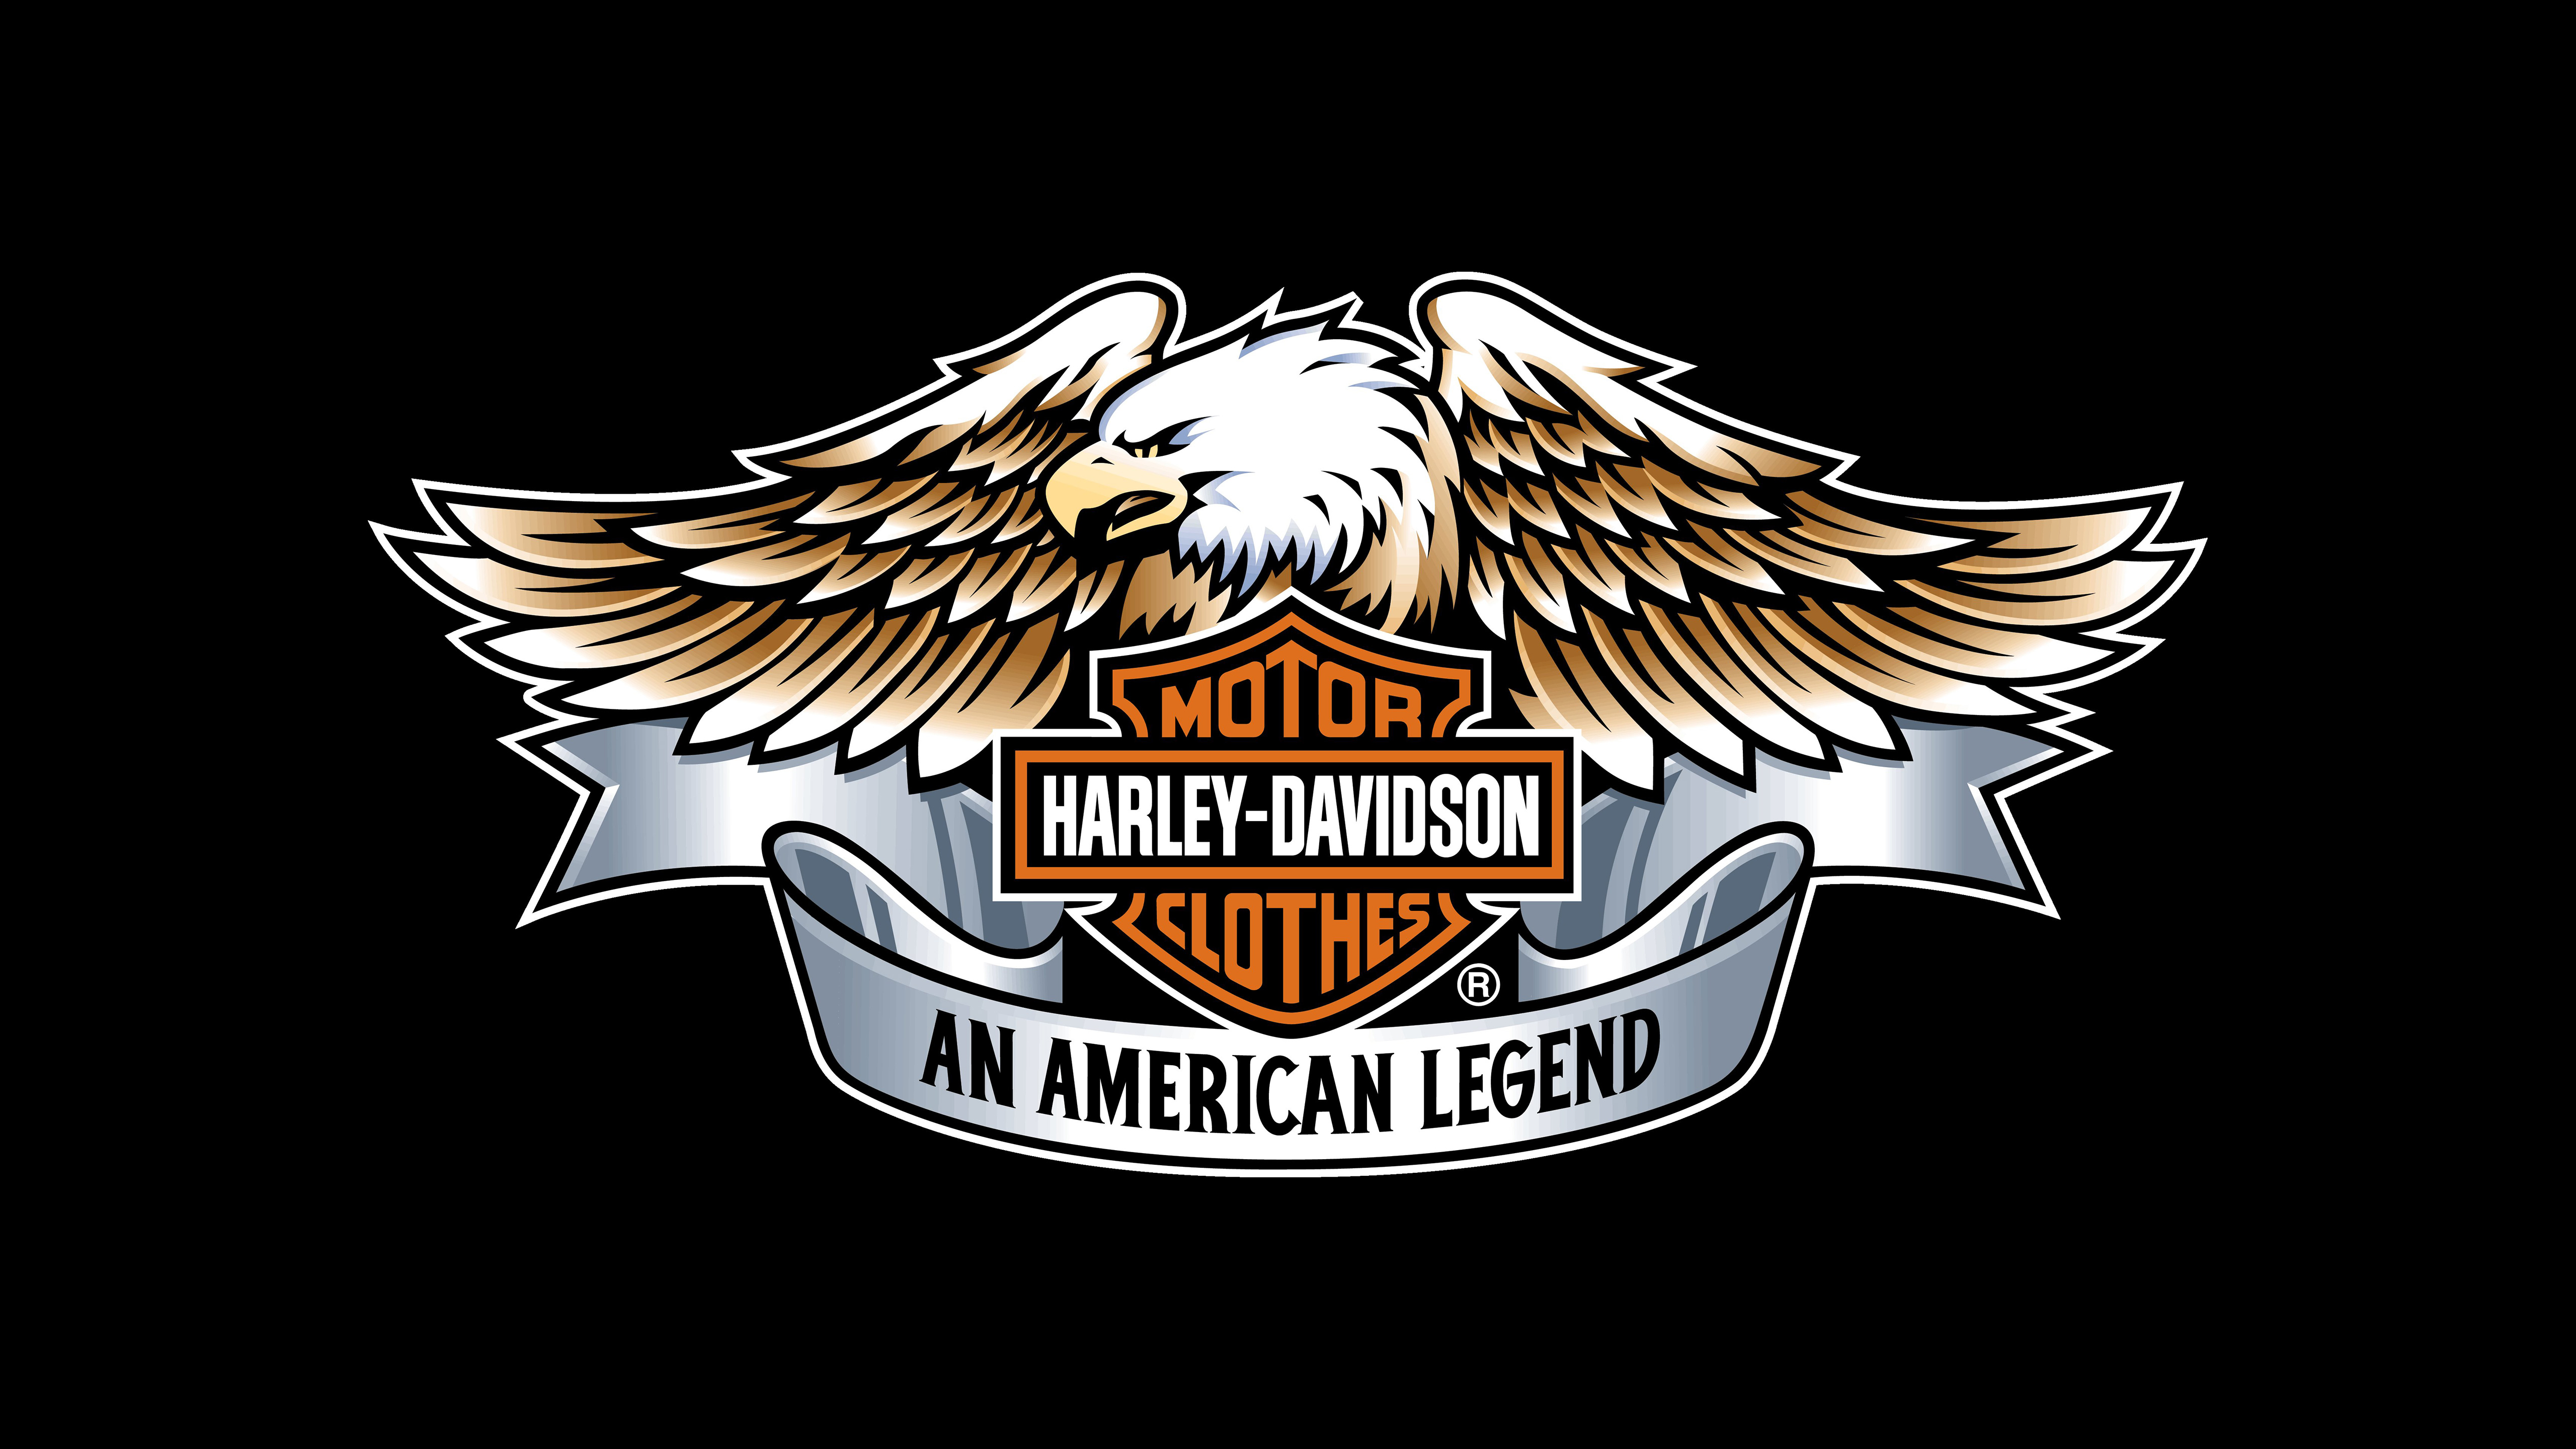 240x400 Harley Davidson Eagle Logo 4k Acer E100huawei